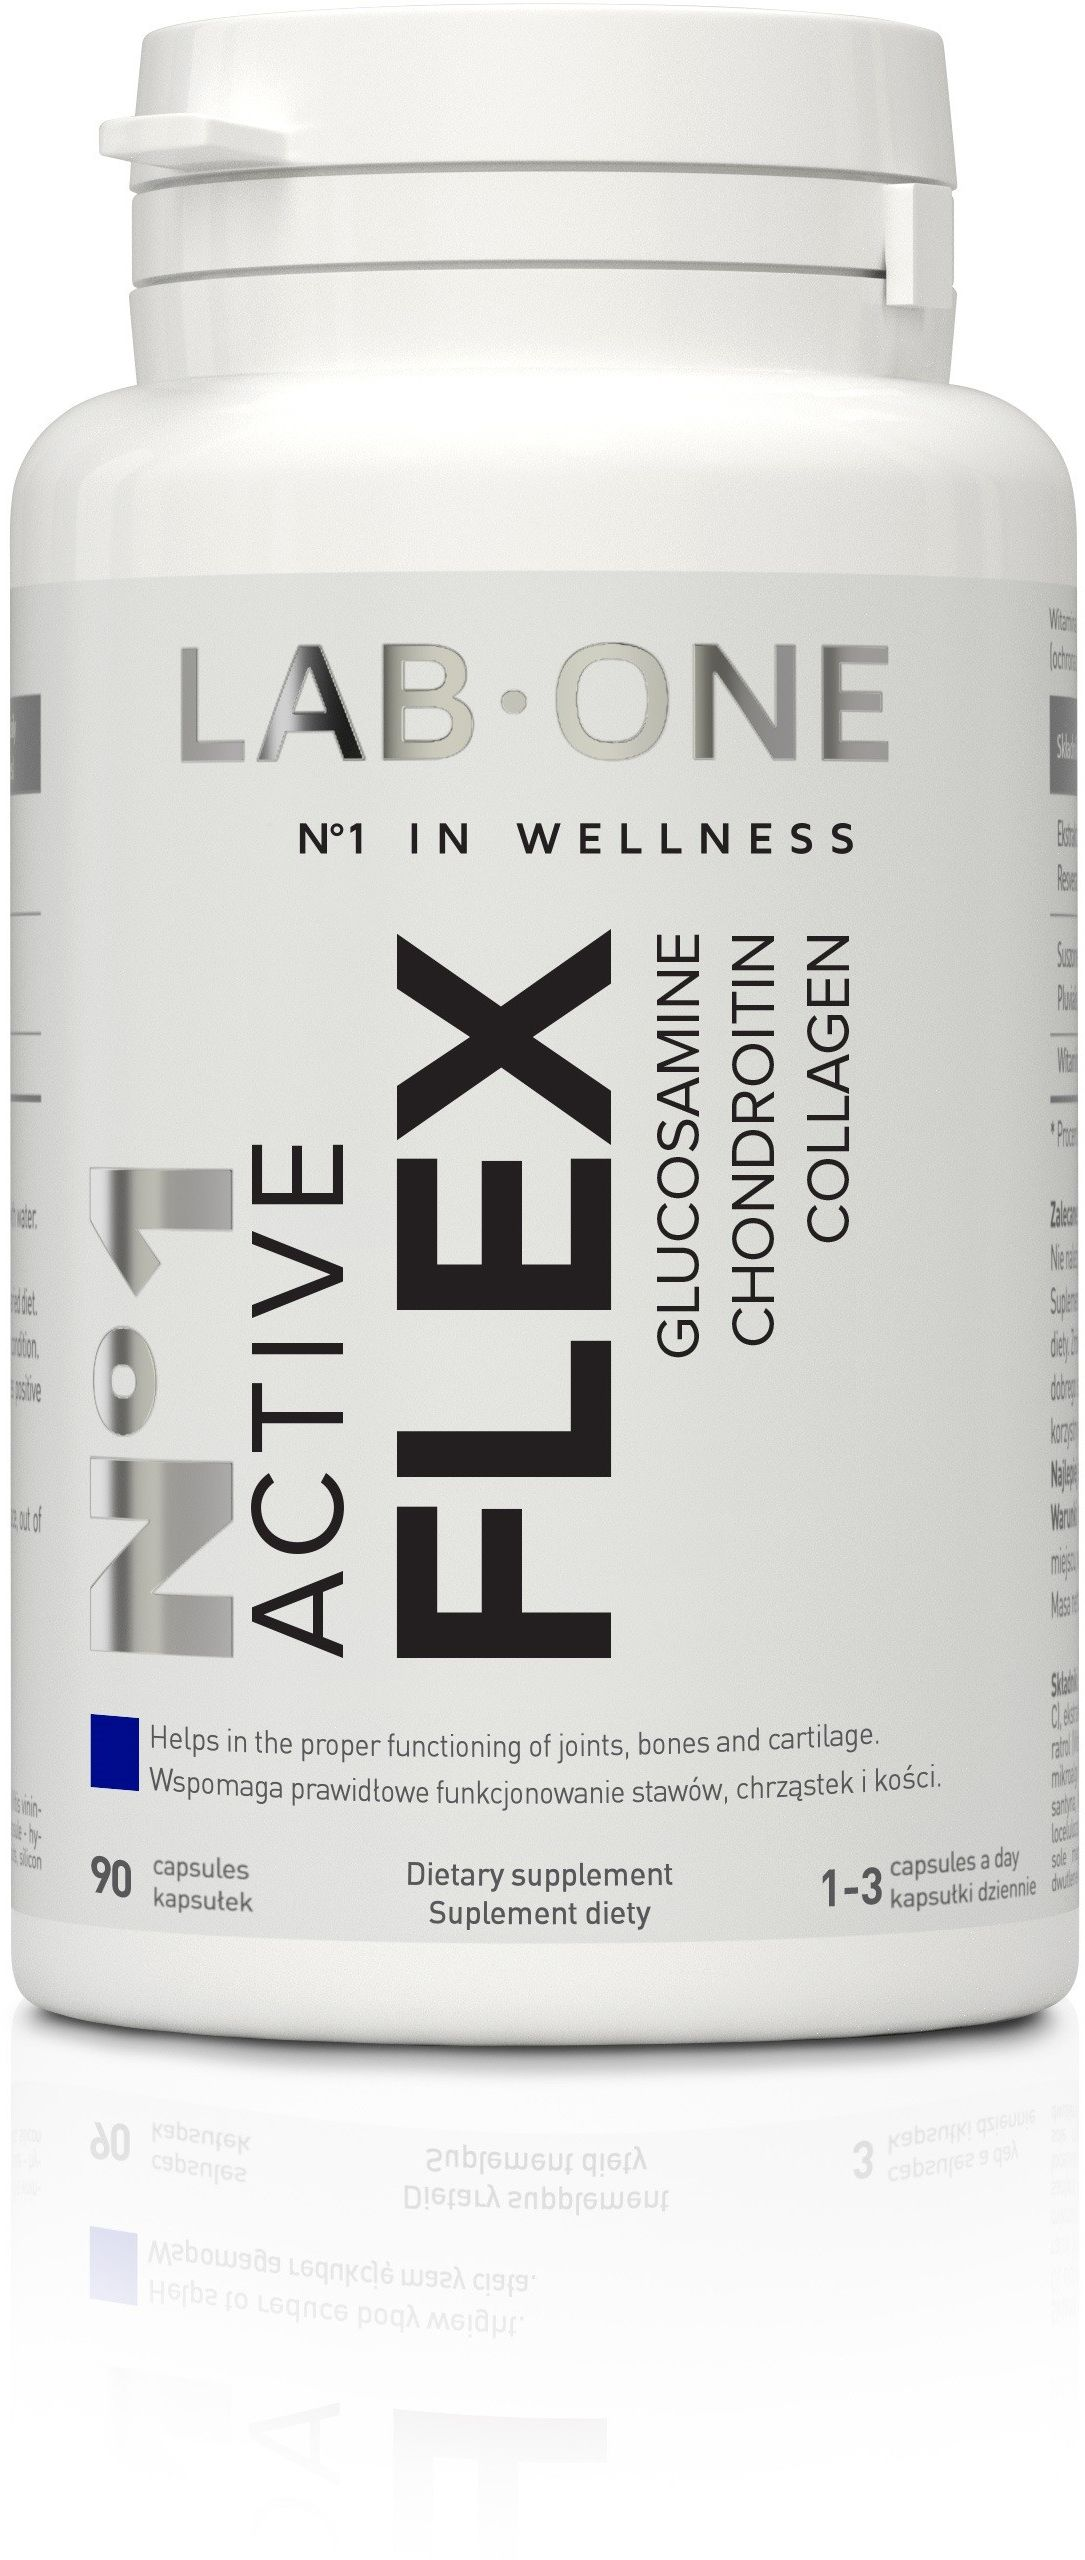 LAB ONE N1 Active Flex (Glukozamina Kolagen Chondroityna) 90 kapsułek